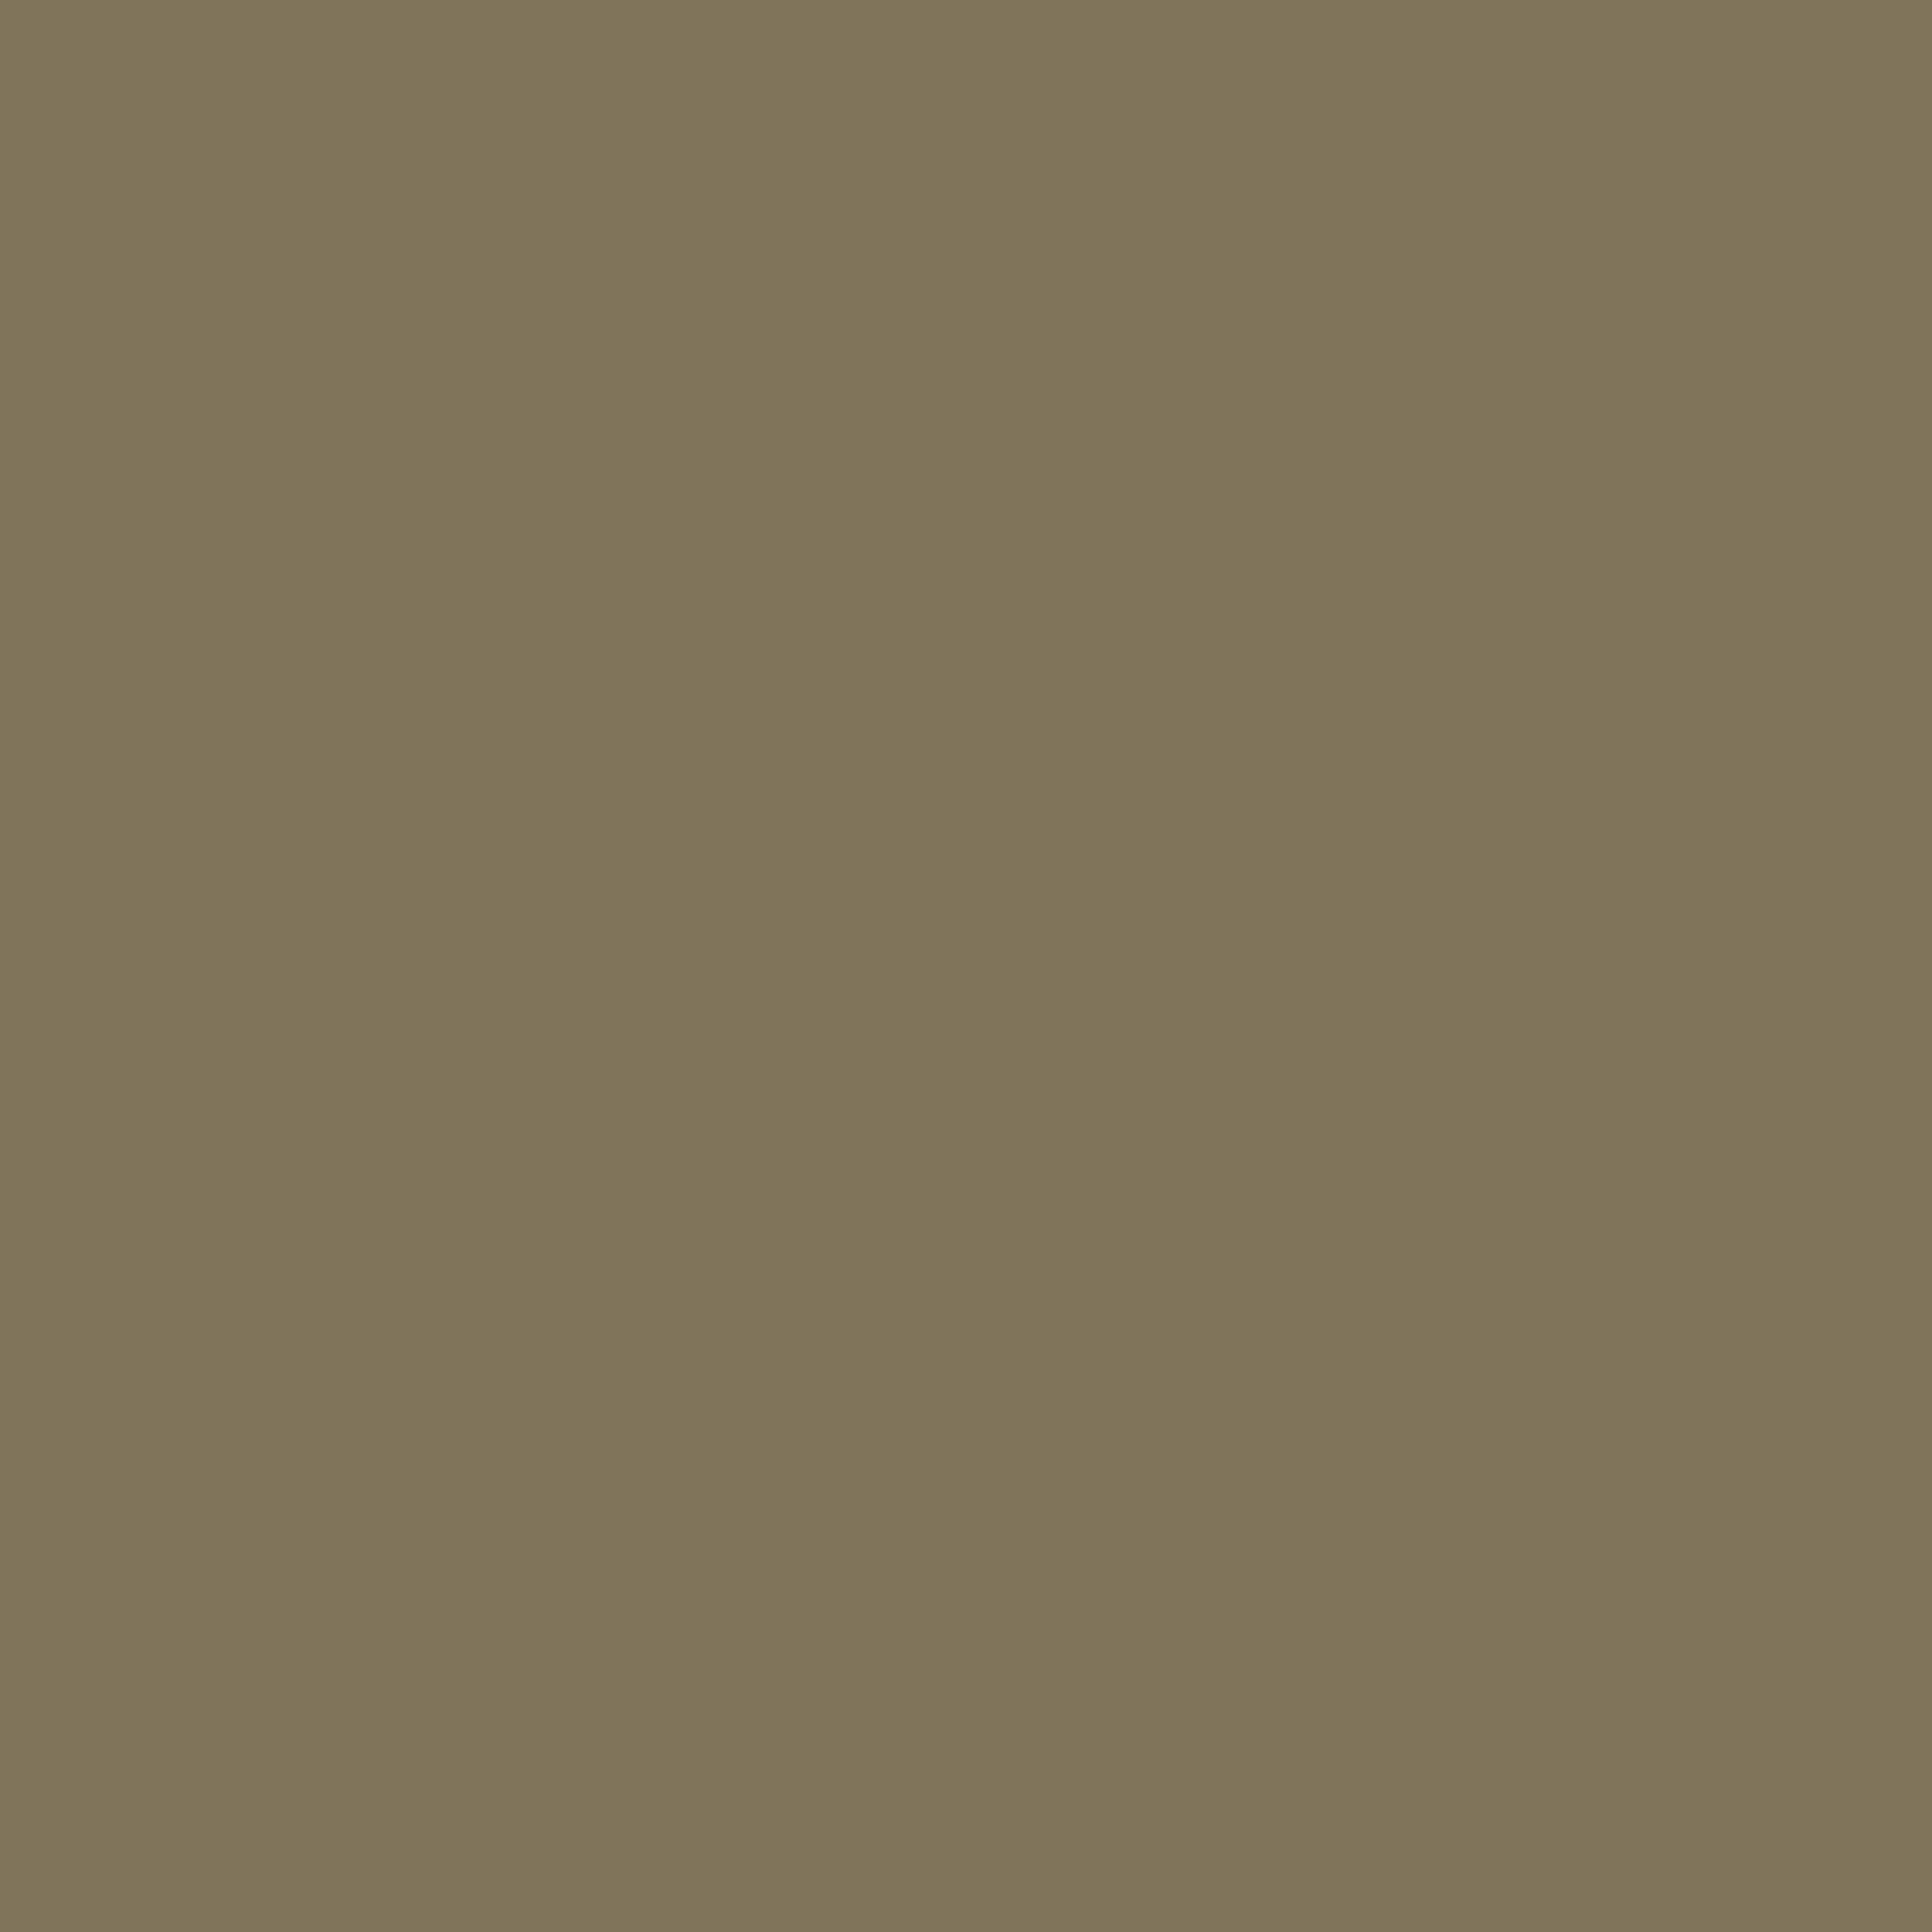 3600x3600 Spanish Bistre Solid Color Background